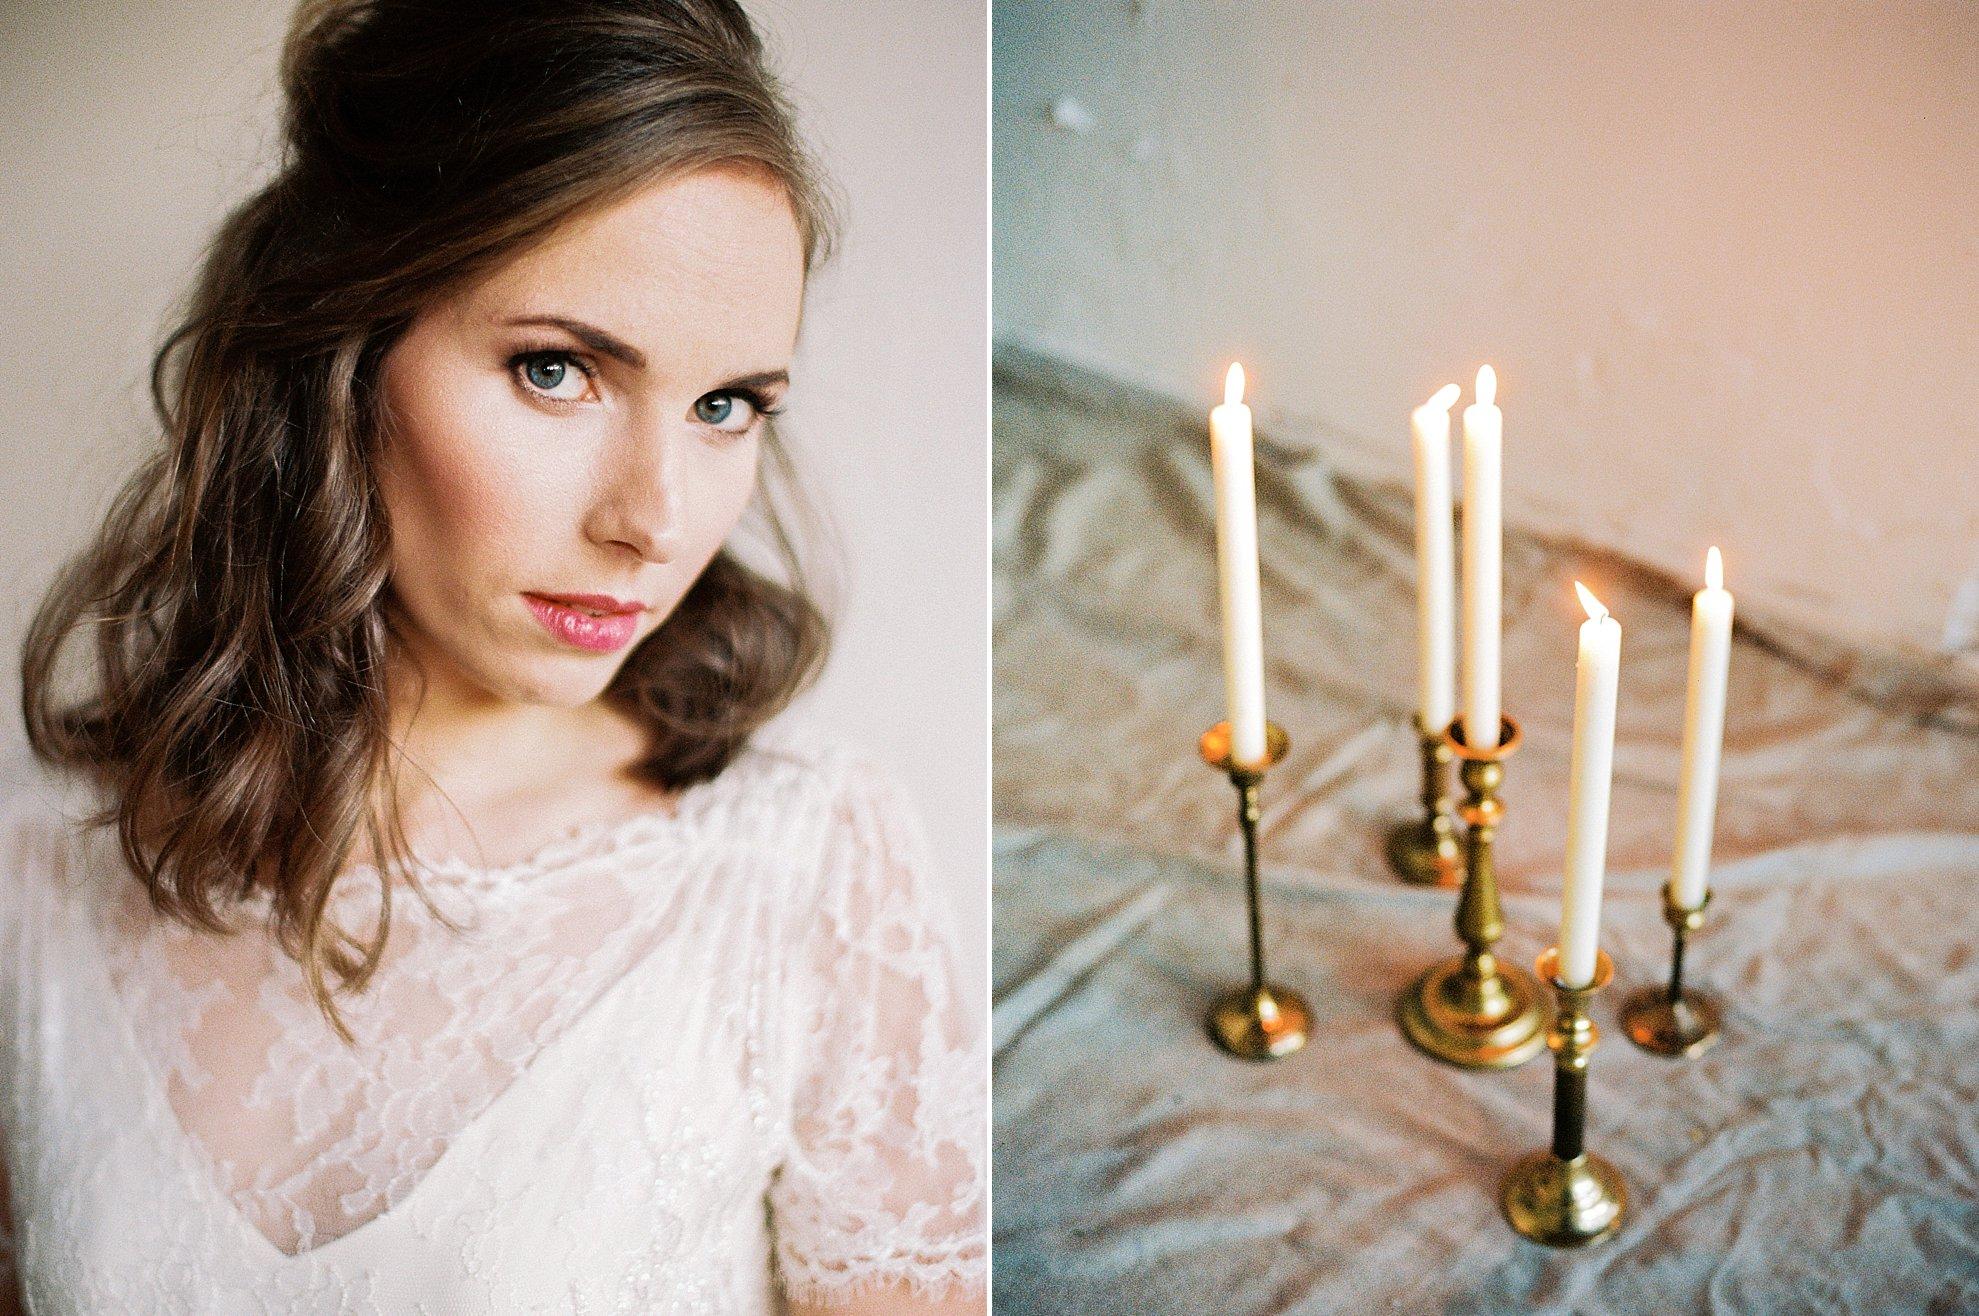 Amanda-Drost-fine-art-photography_0014.jpg